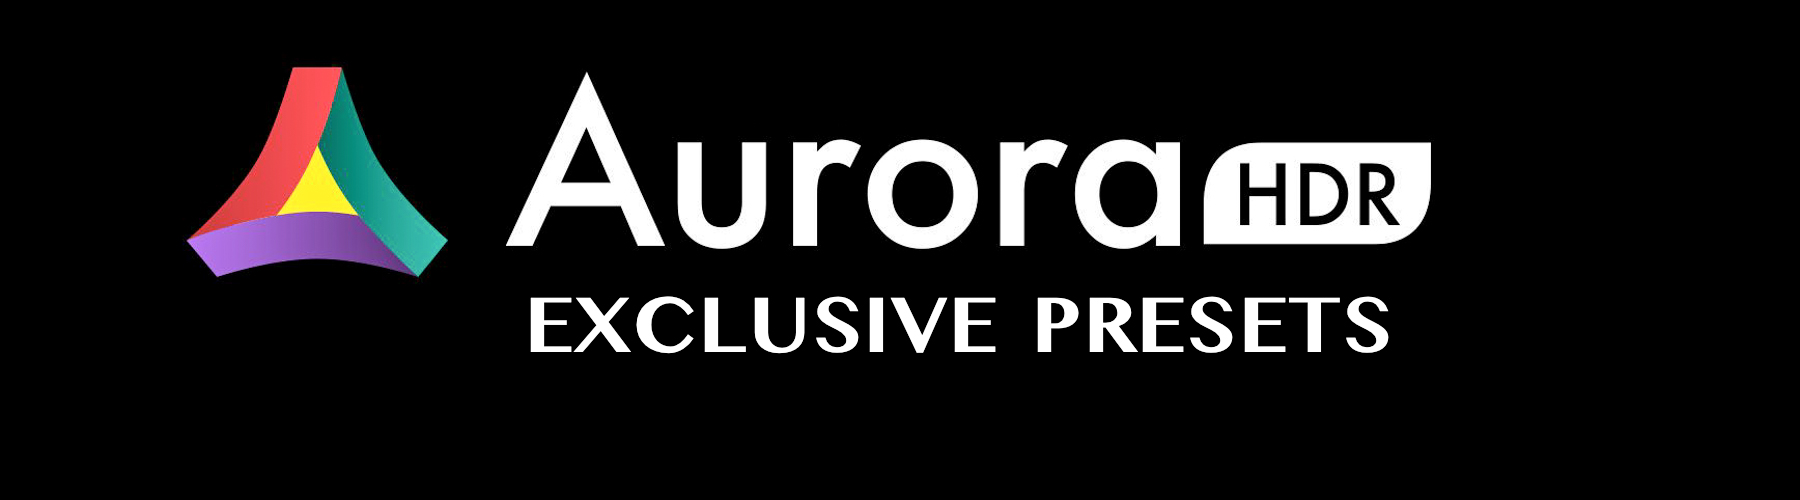 PREMIUM and FREE Aurora HDR Presets from PixaFOTO.com